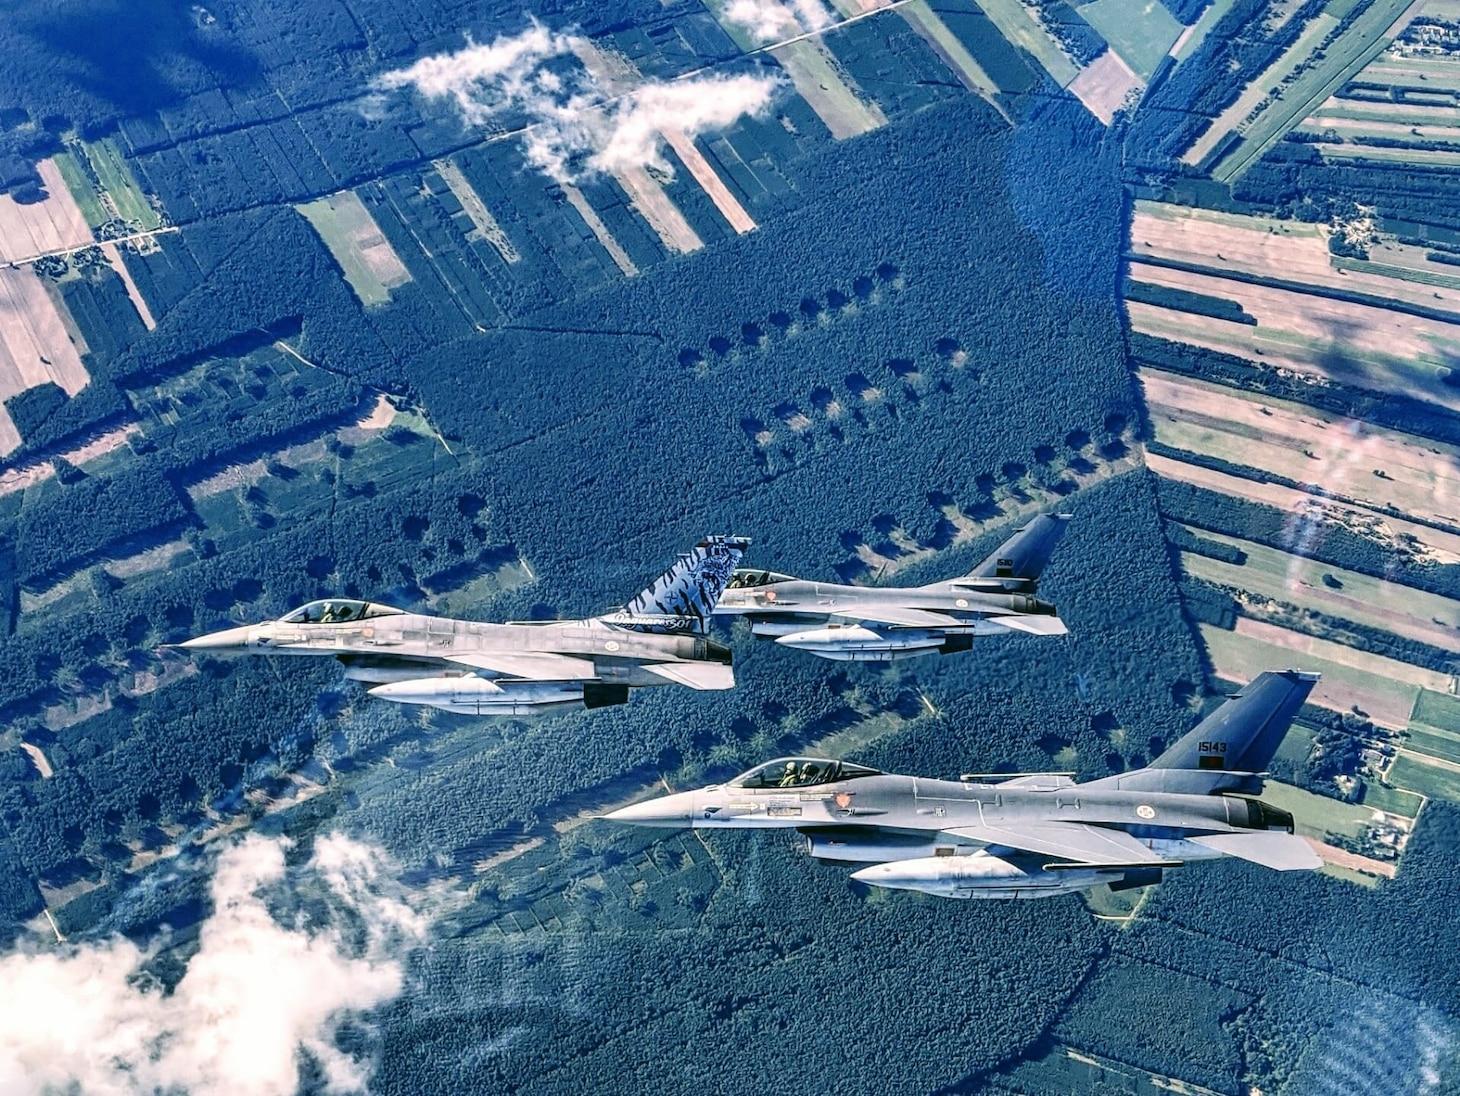 Portuguese Air Force